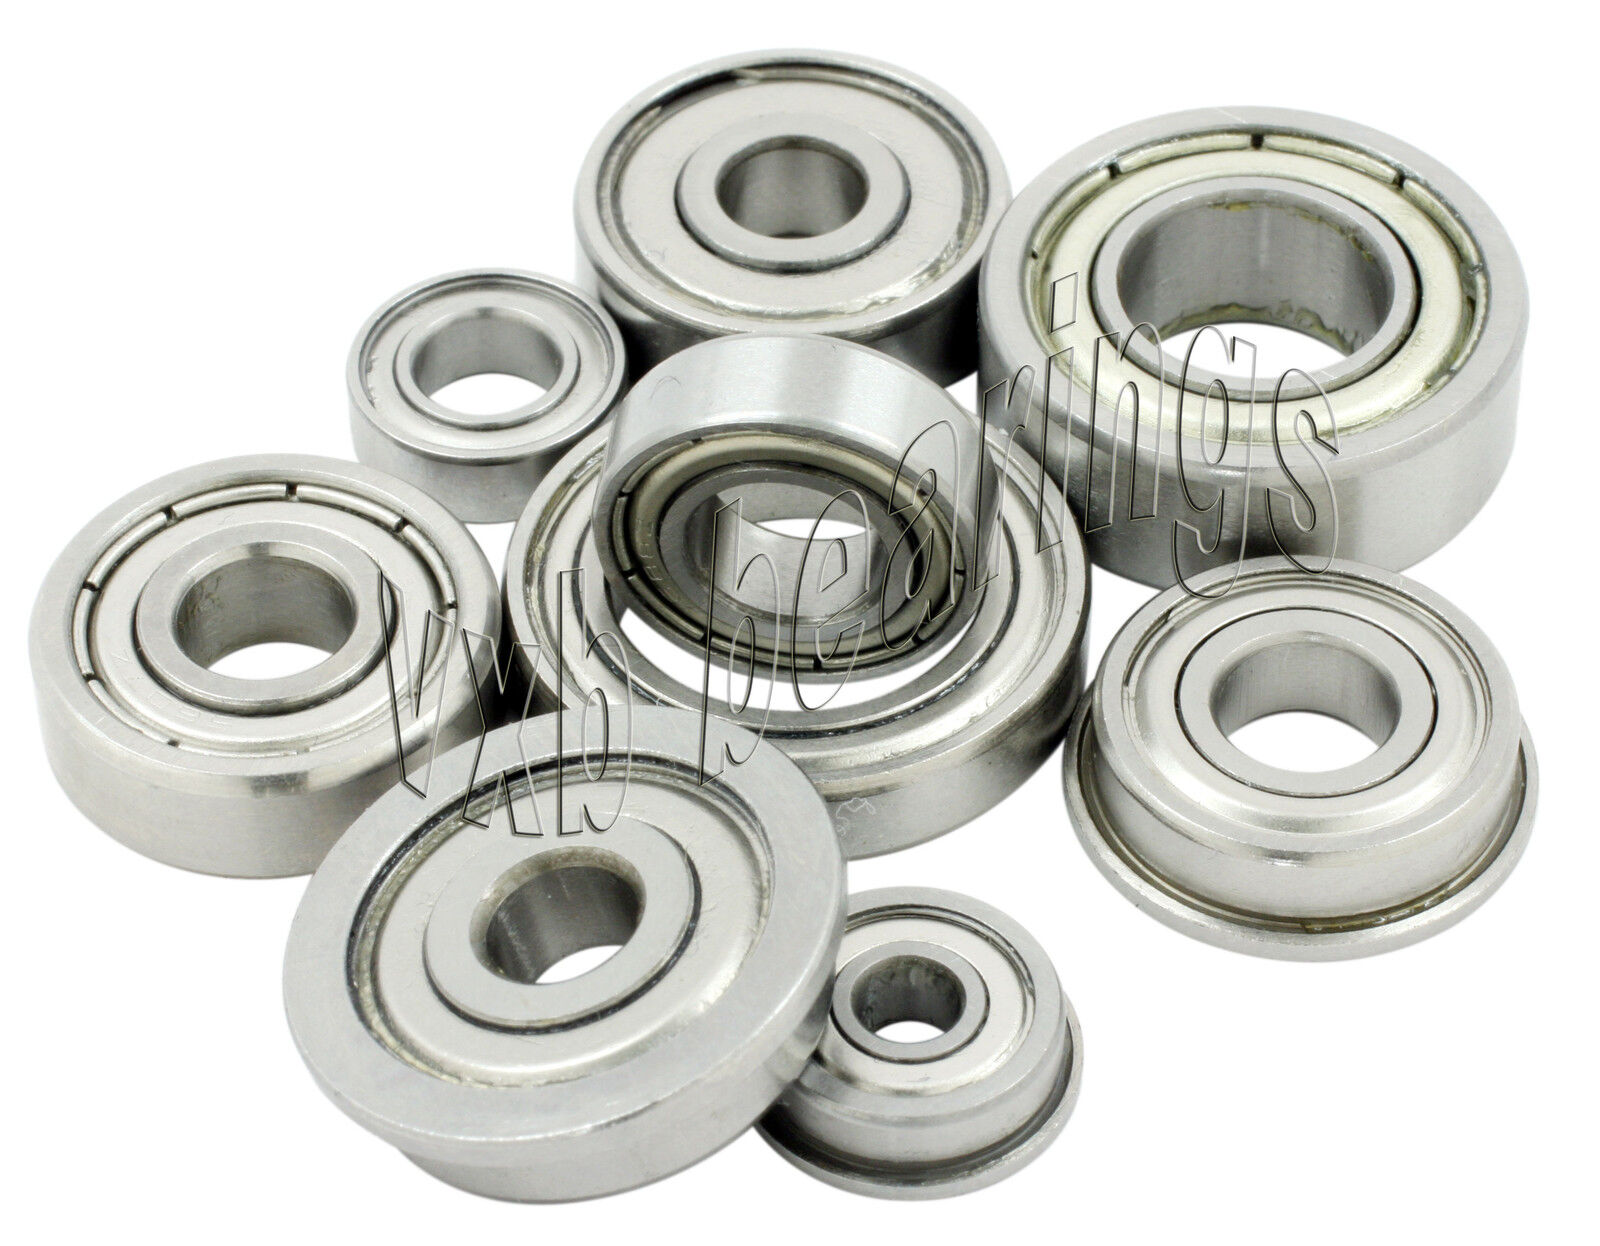 ABEC-7 SPOOL//TENS Hybrid Ceramic Ball Bearings Fits QUANTUM SMOKE PT SL100HPT